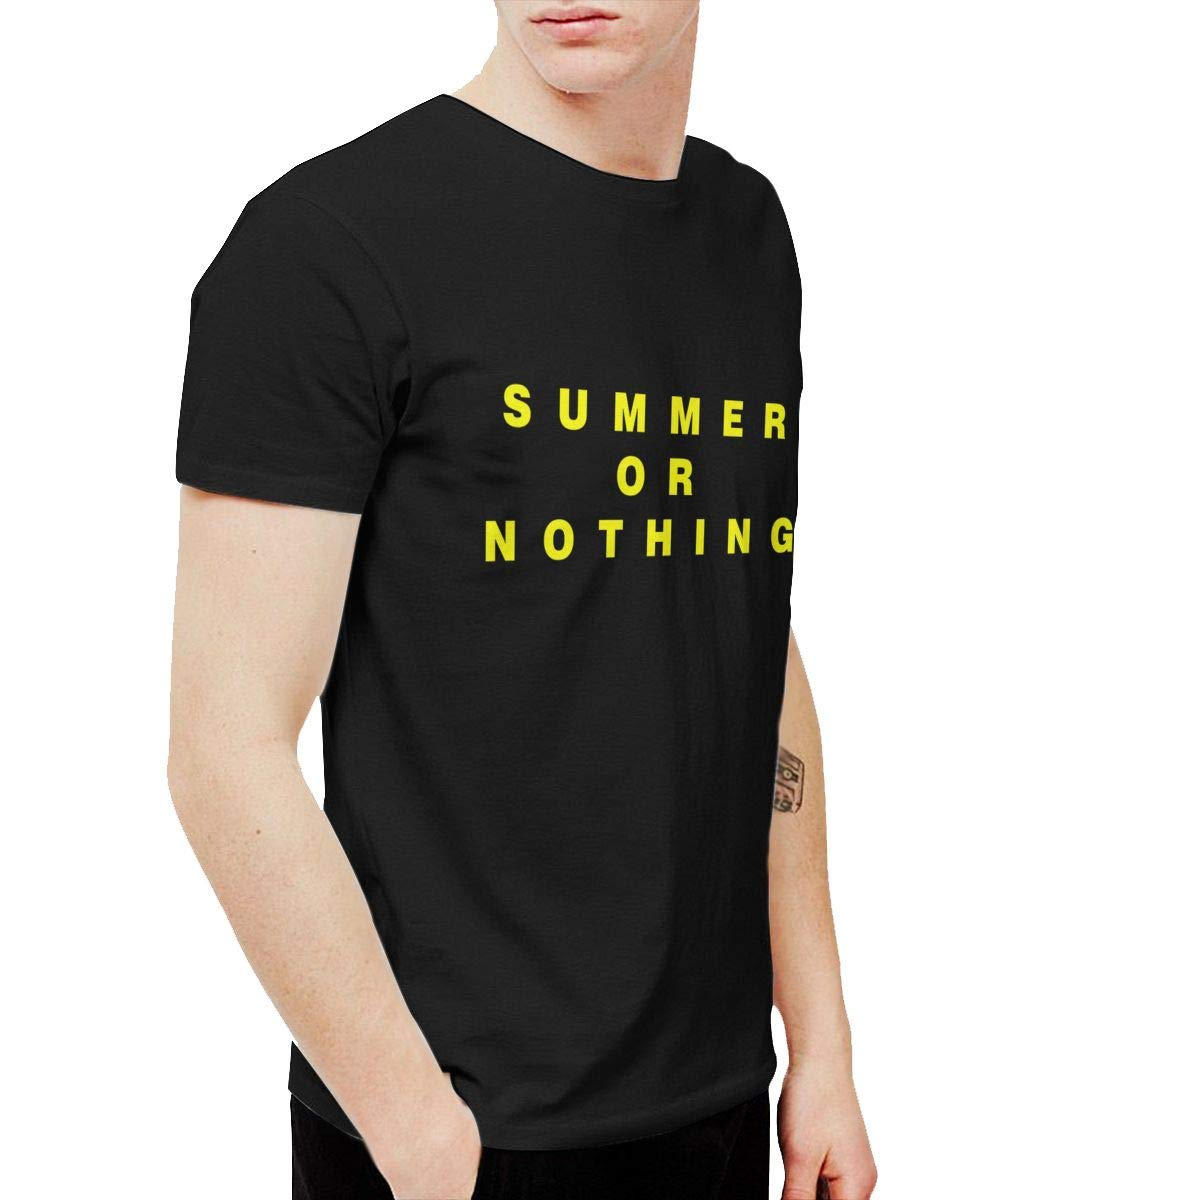 Twocjlrq Summer Or Nothing Comfortable Tshirt Black